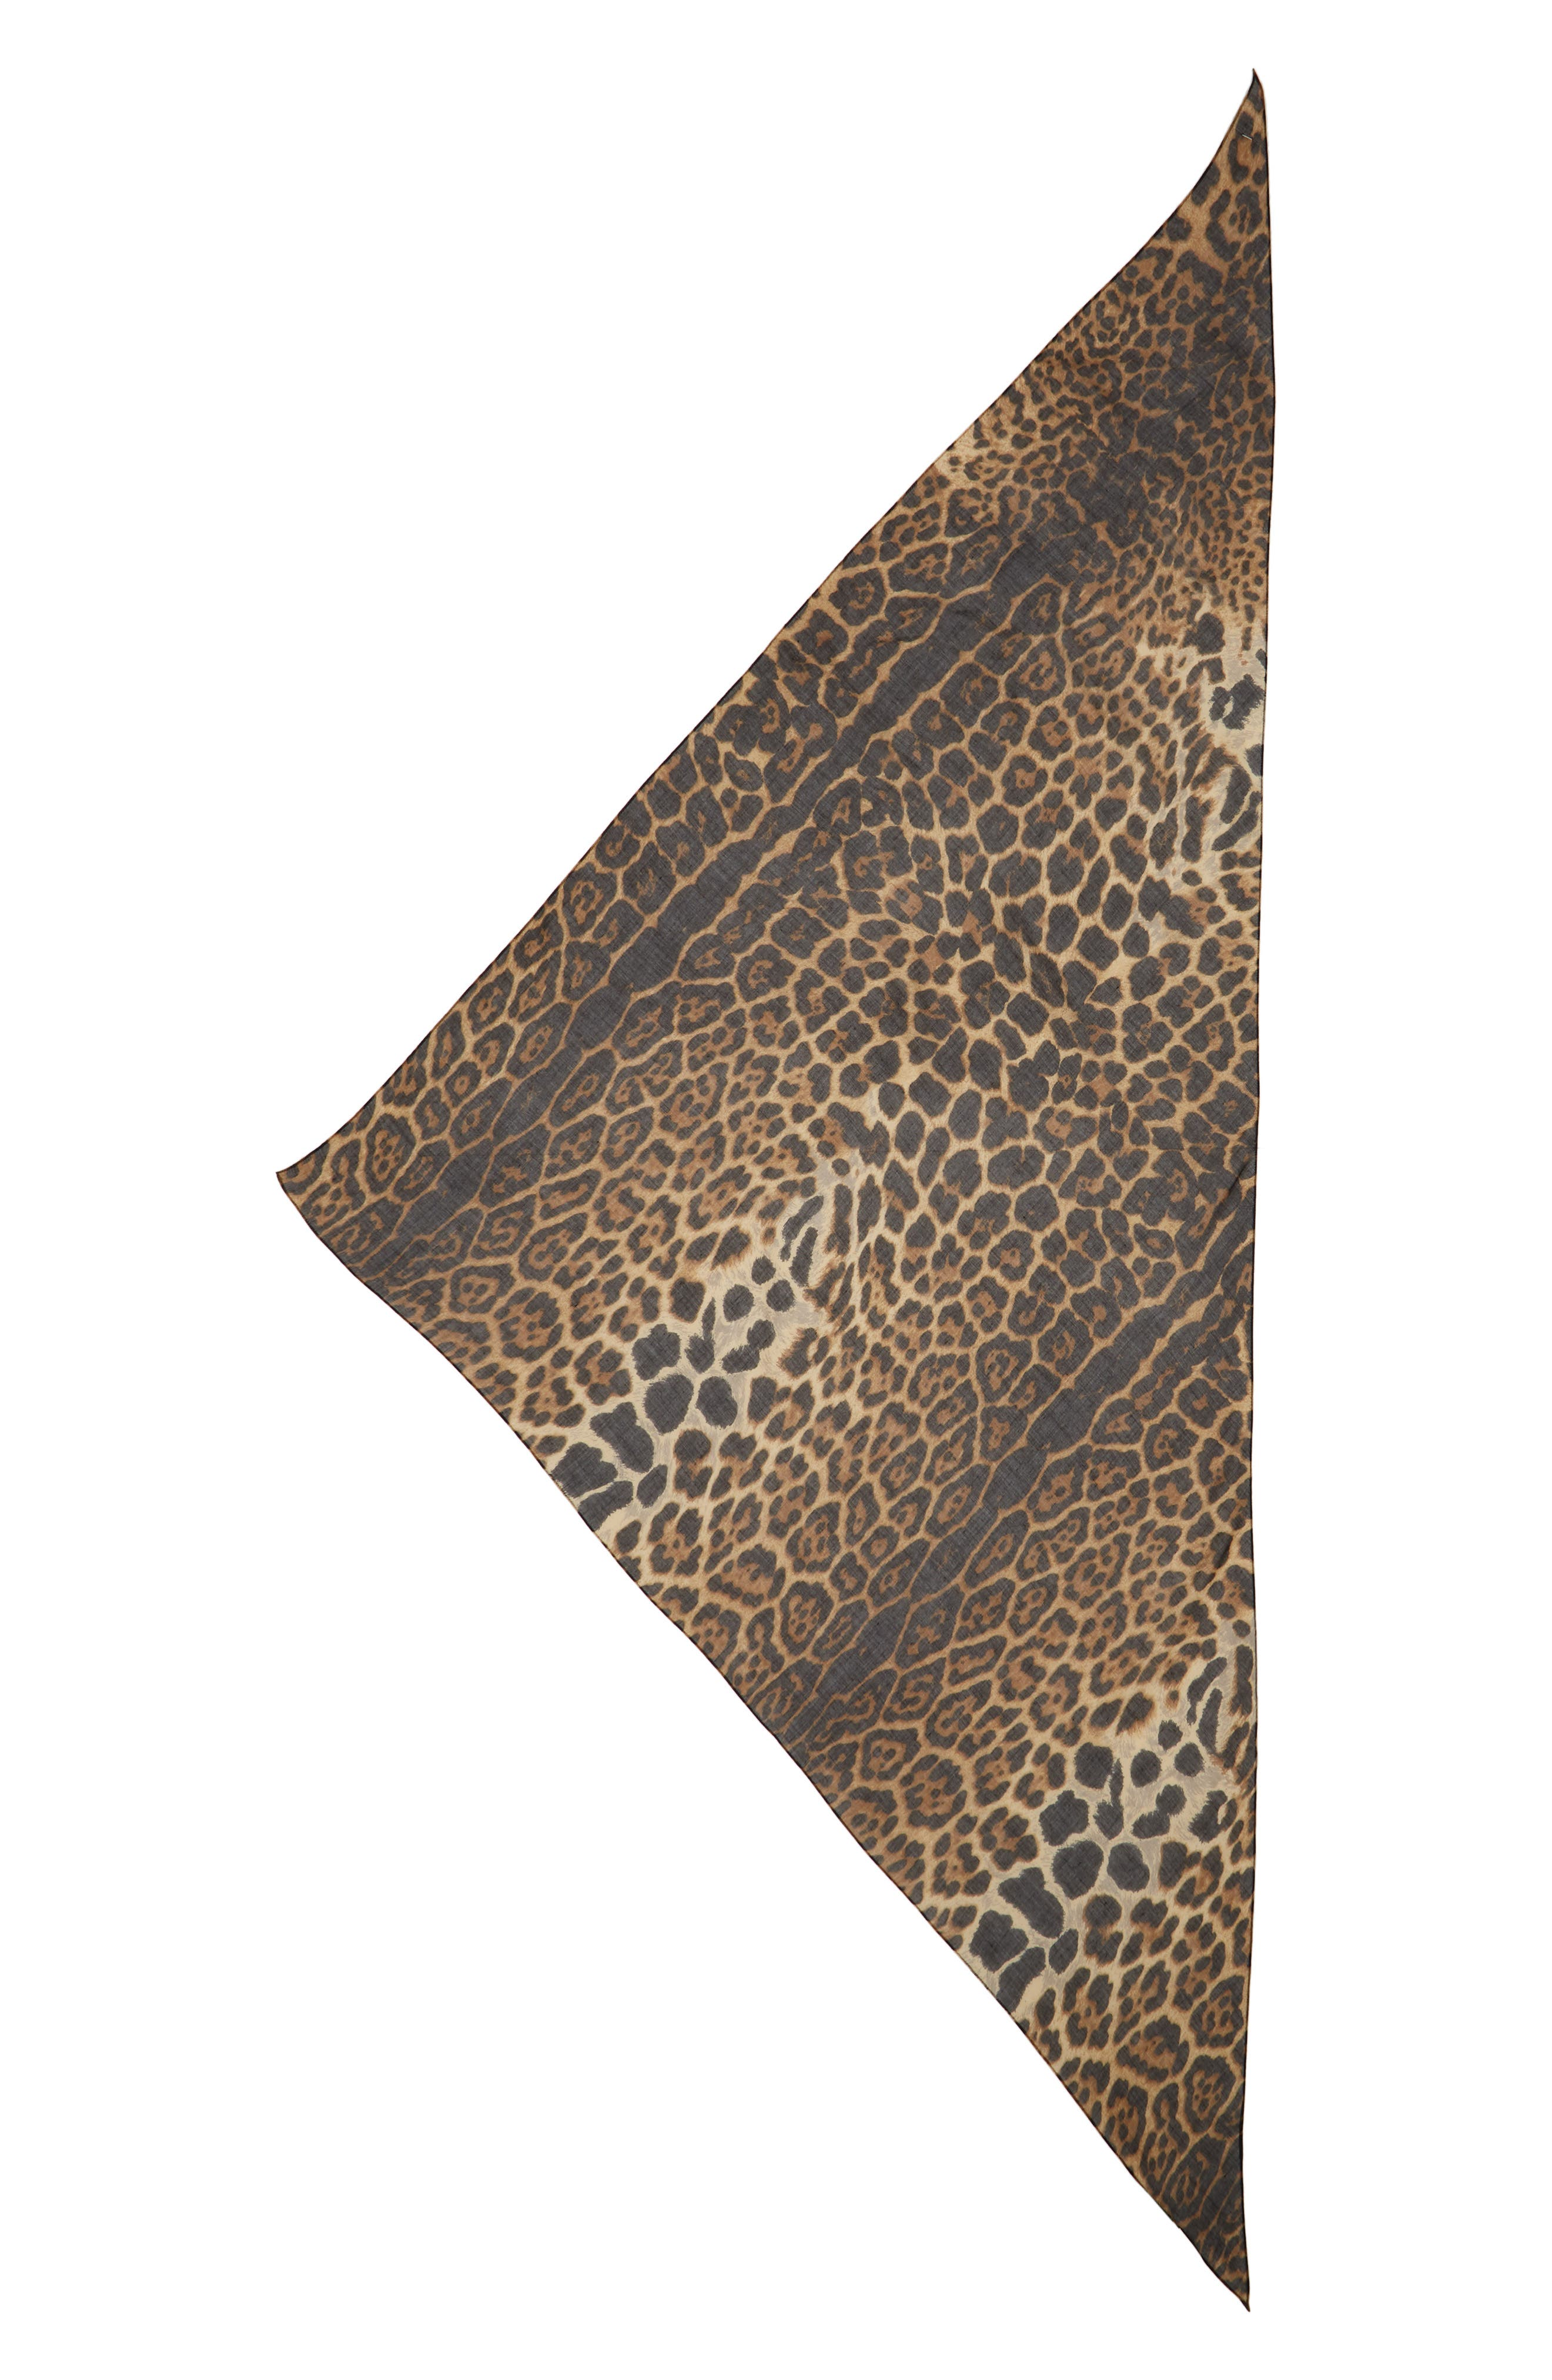 YSL Leopard Print Cashmere & Silk Triangle Scarf,                             Main thumbnail 1, color,                             Mahogany/ Black